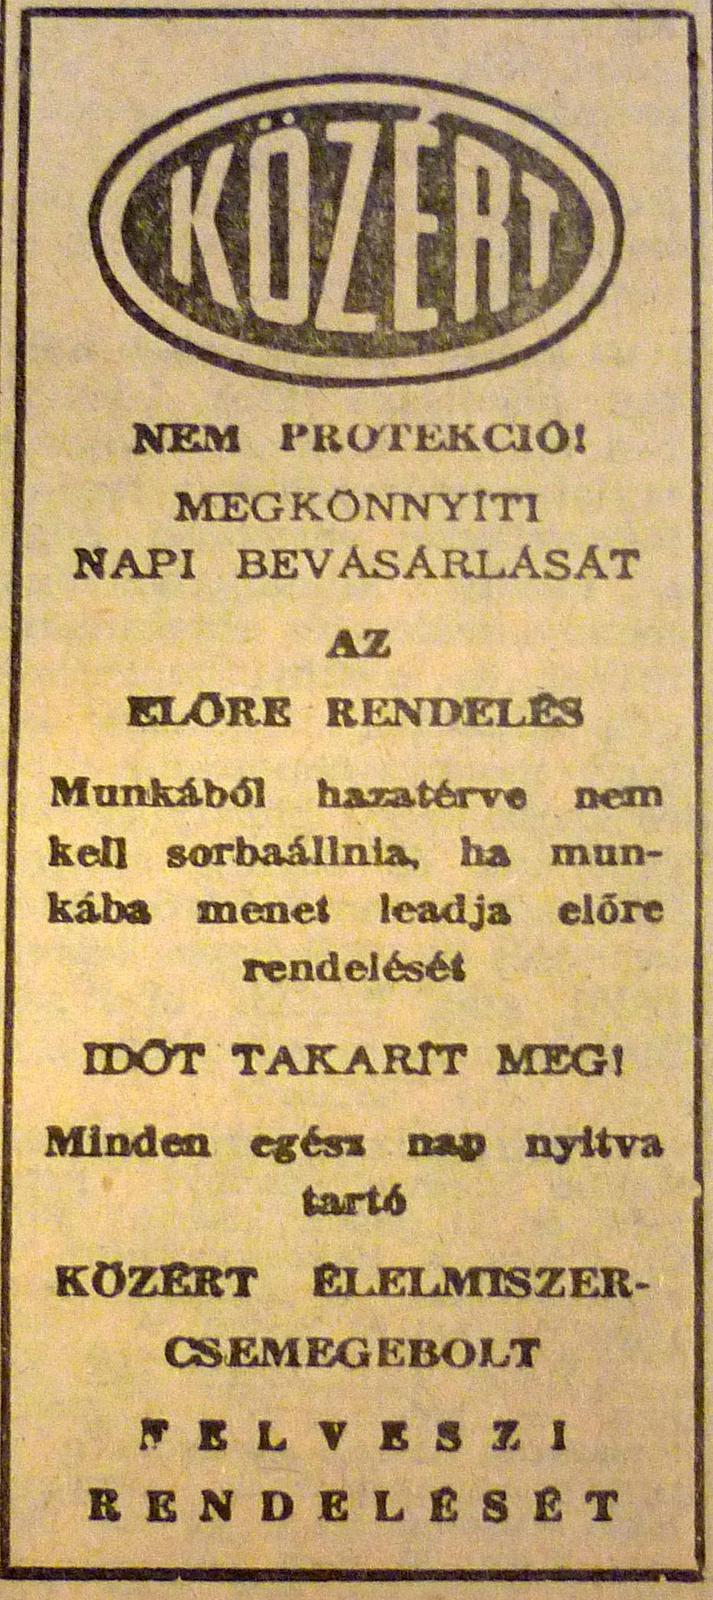 fovarosi.blog.hu: KOZERT-19650204-MagyarNemzet - indafoto.hu